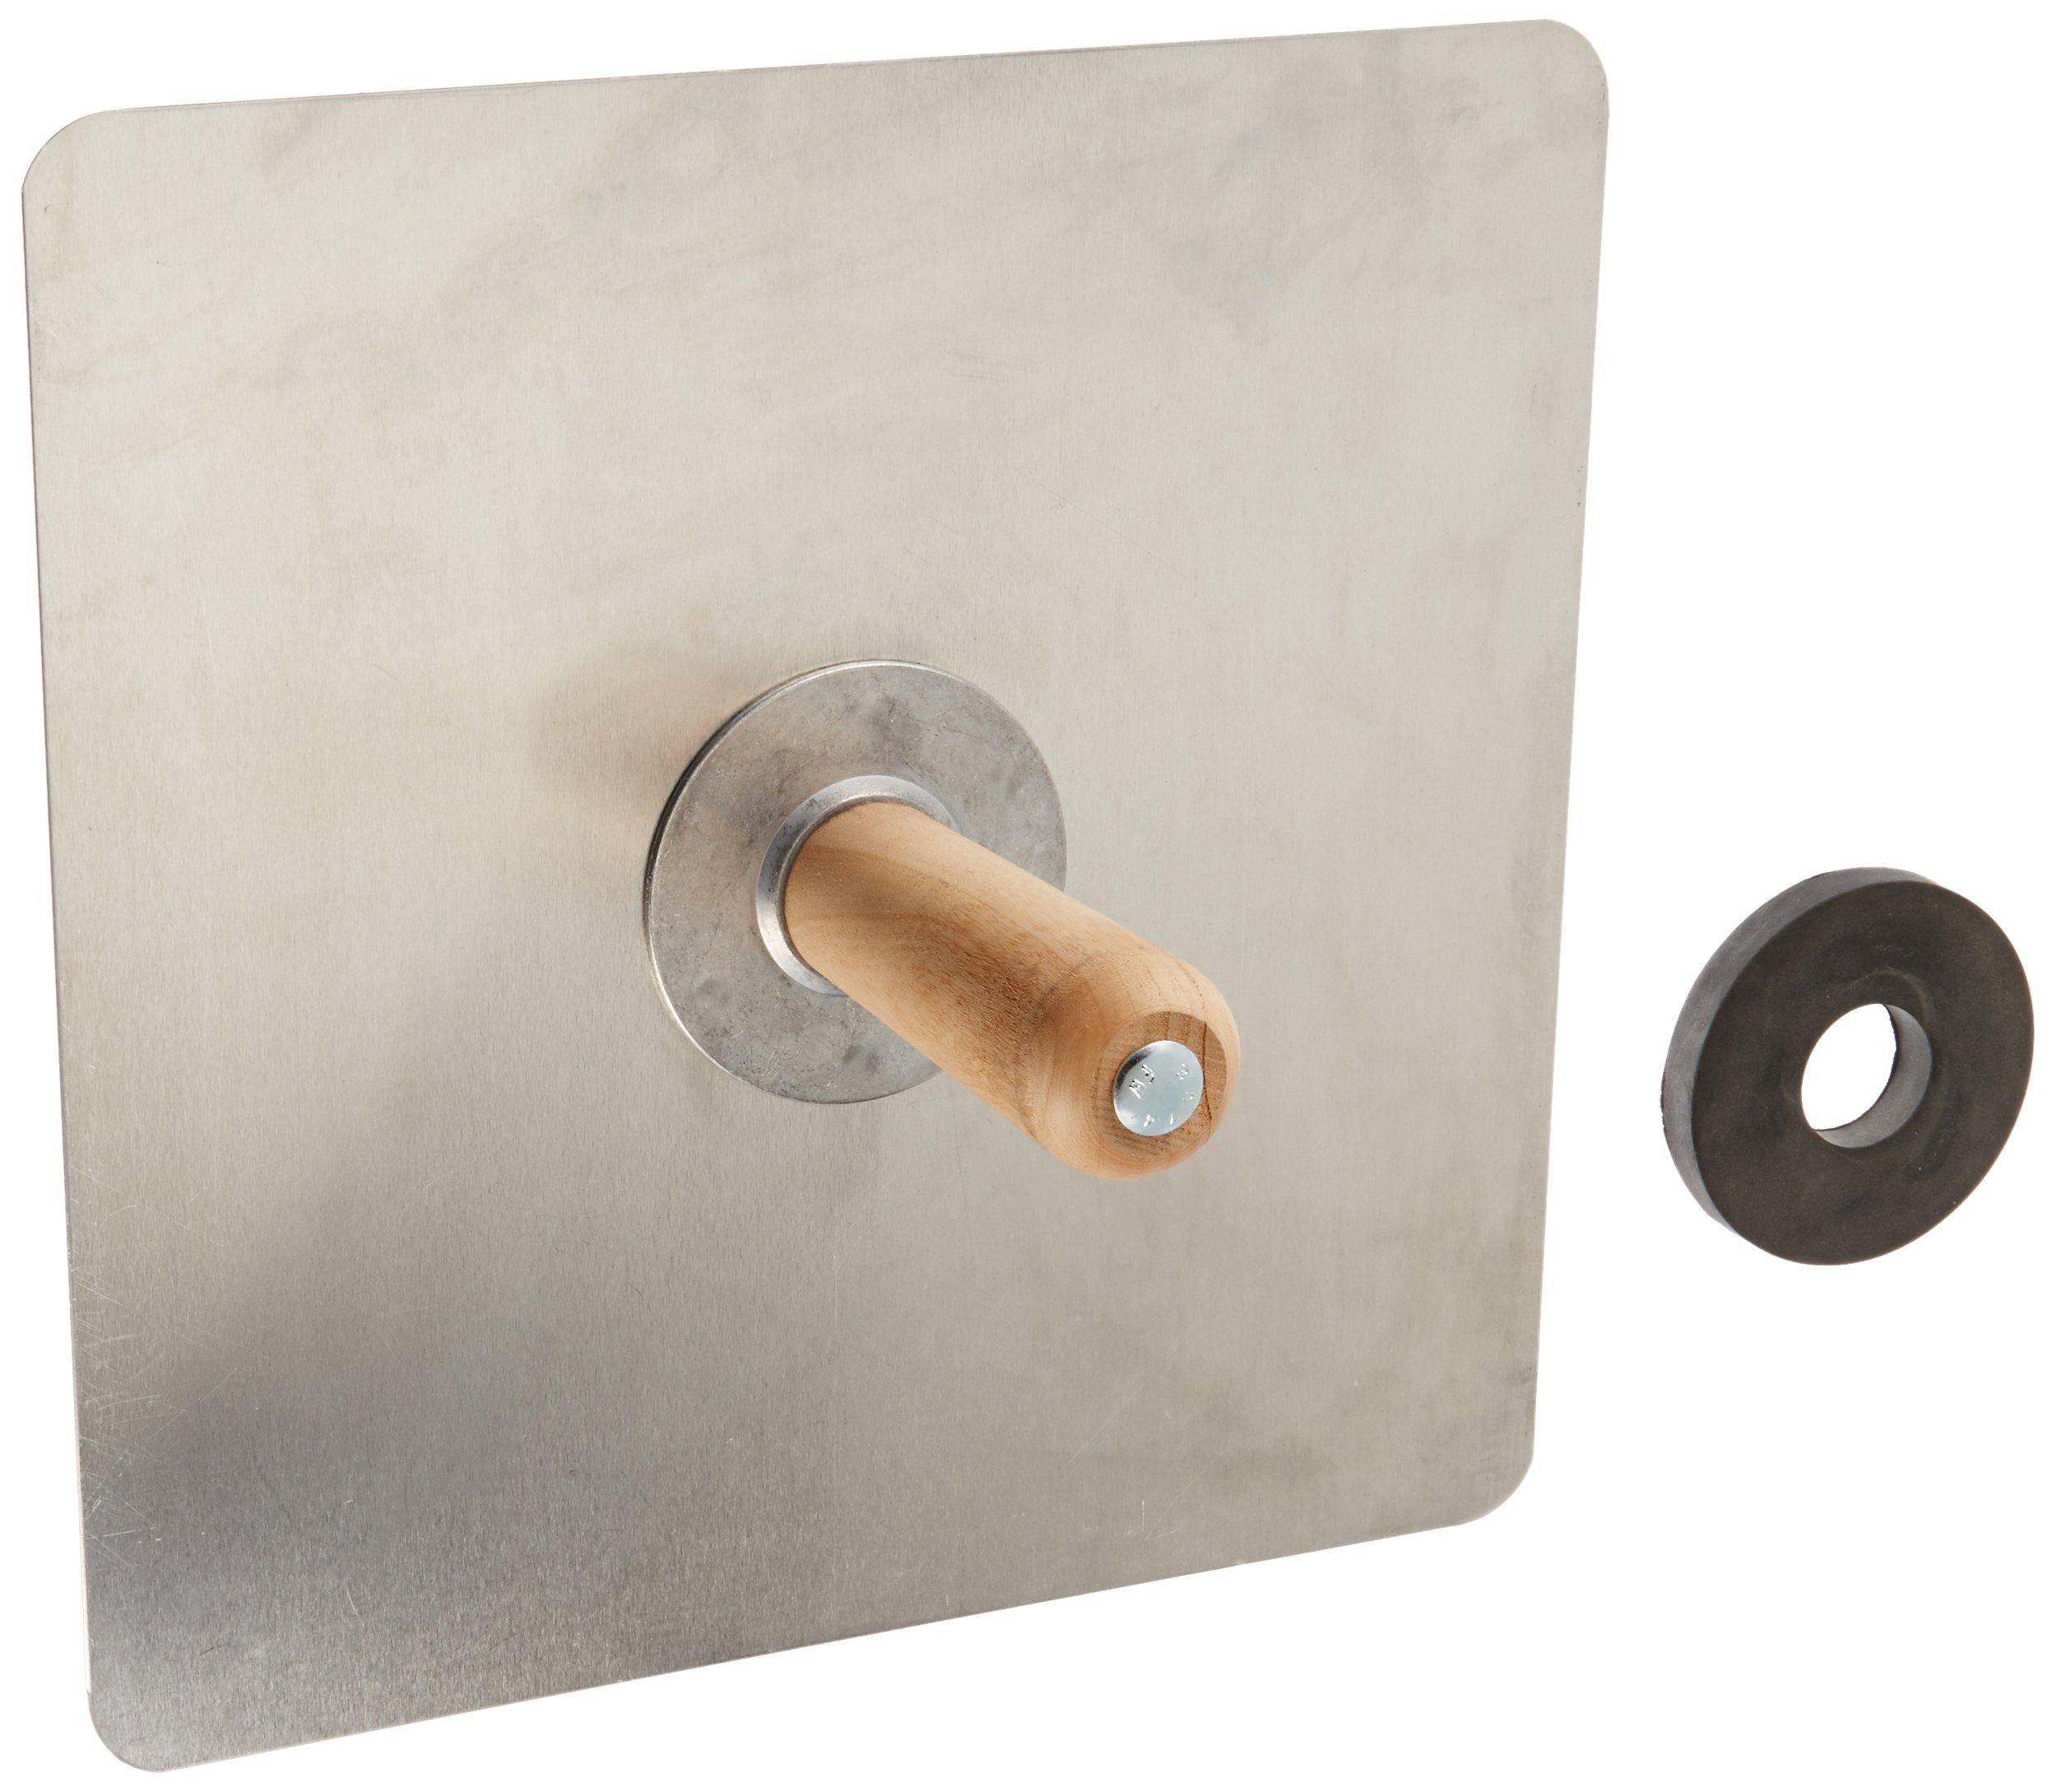 SL520 - 13-13- Aluminum Plastering Hawk by Sands Level & Tool